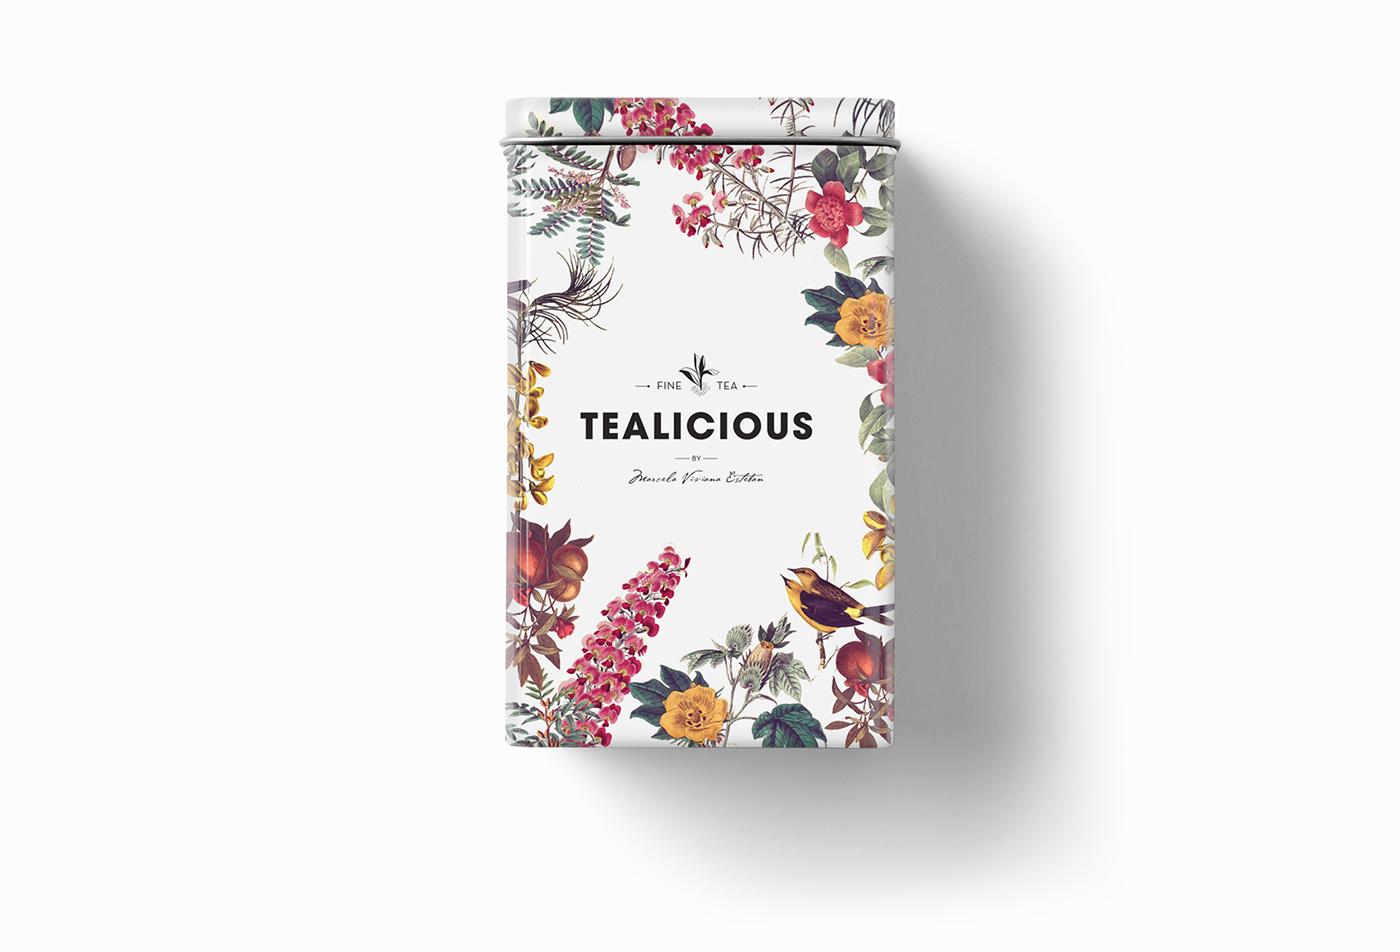 tea shop logo firenze Italy Florence te tealicious Flowers texture pattern Label